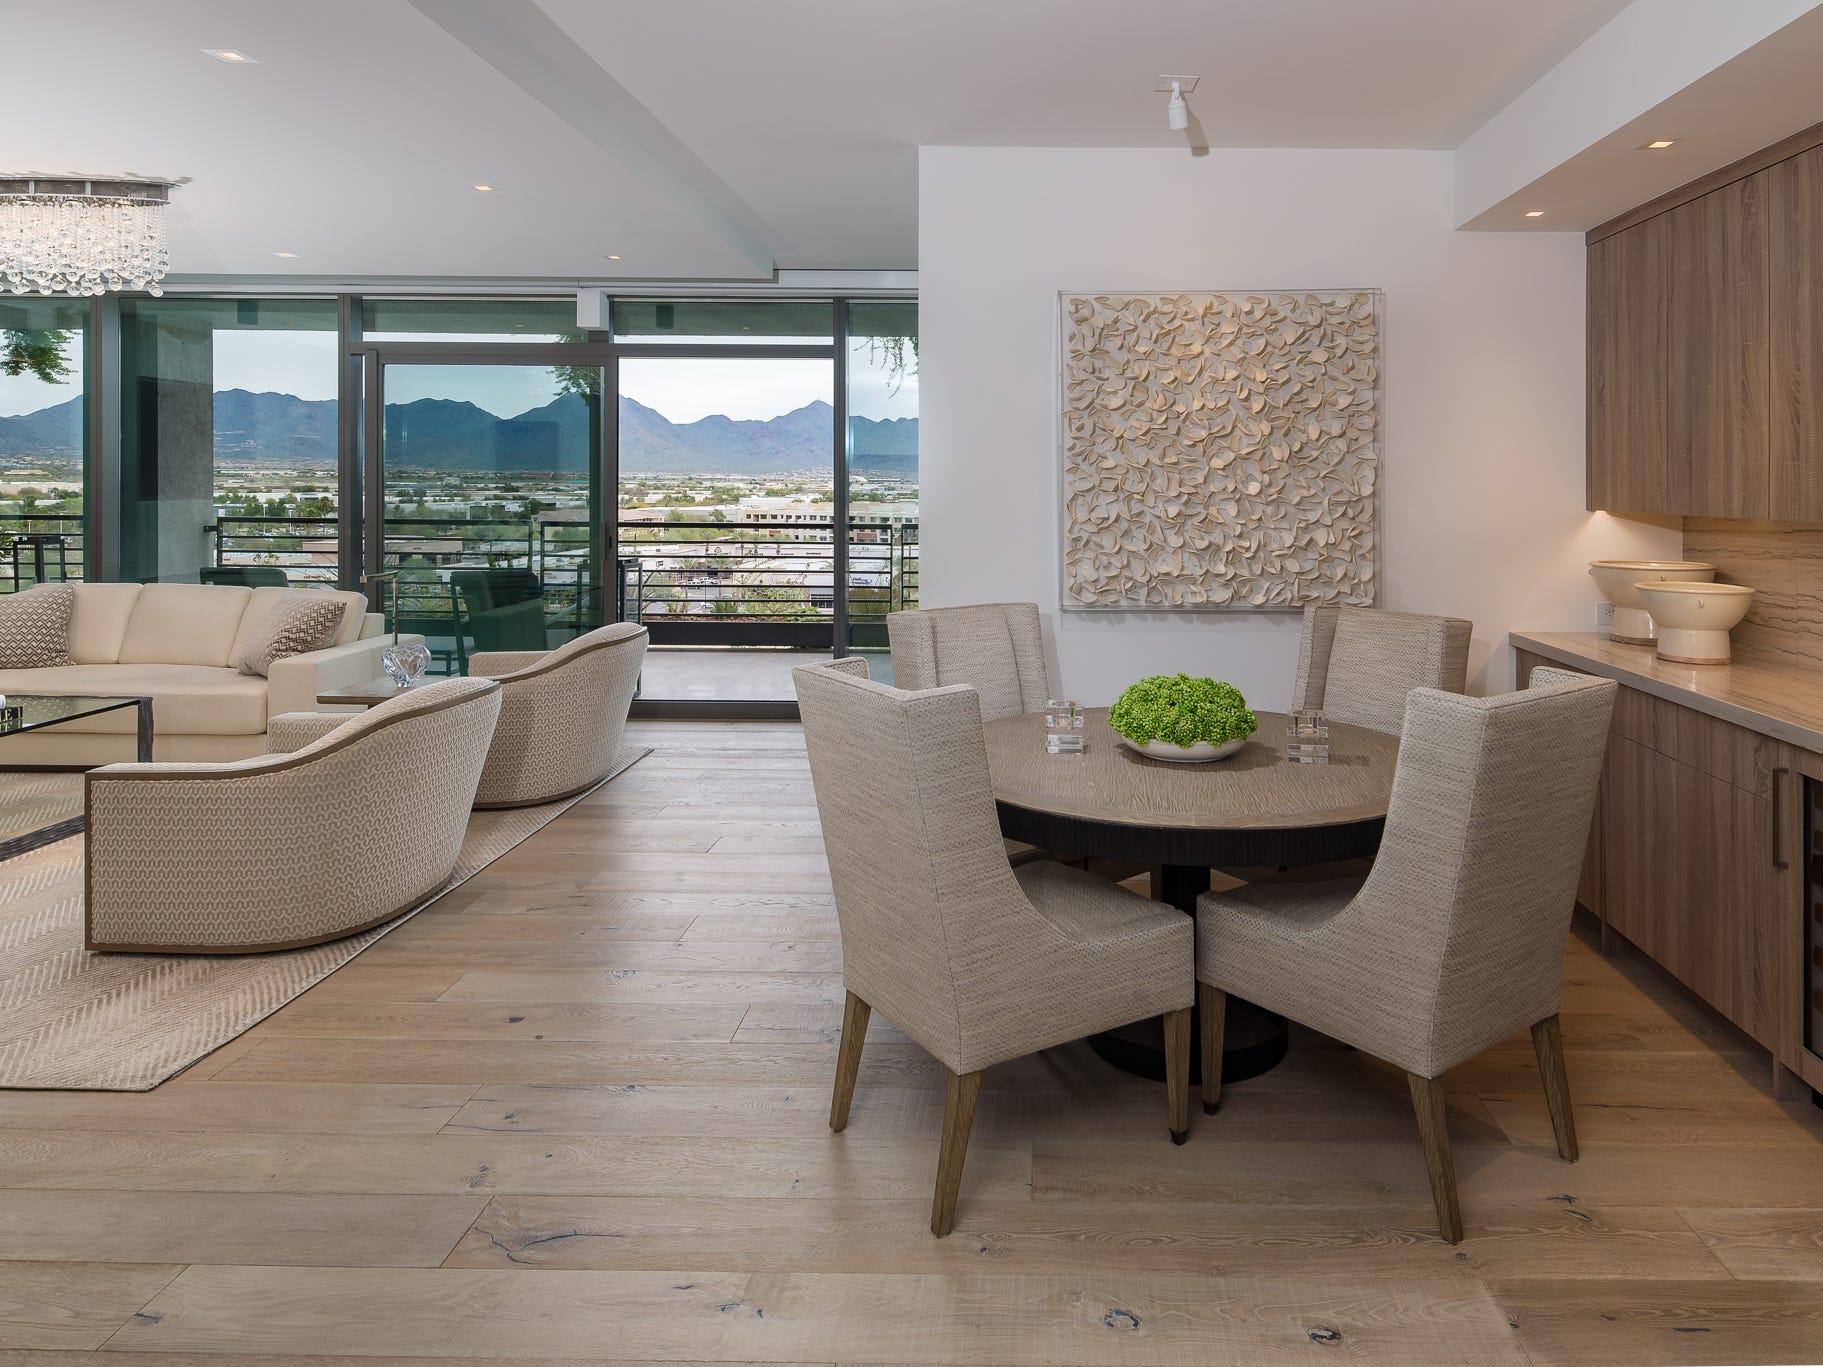 The Krebs home is located in the 7120 Optima Kierland condominium community in Scottsdale.